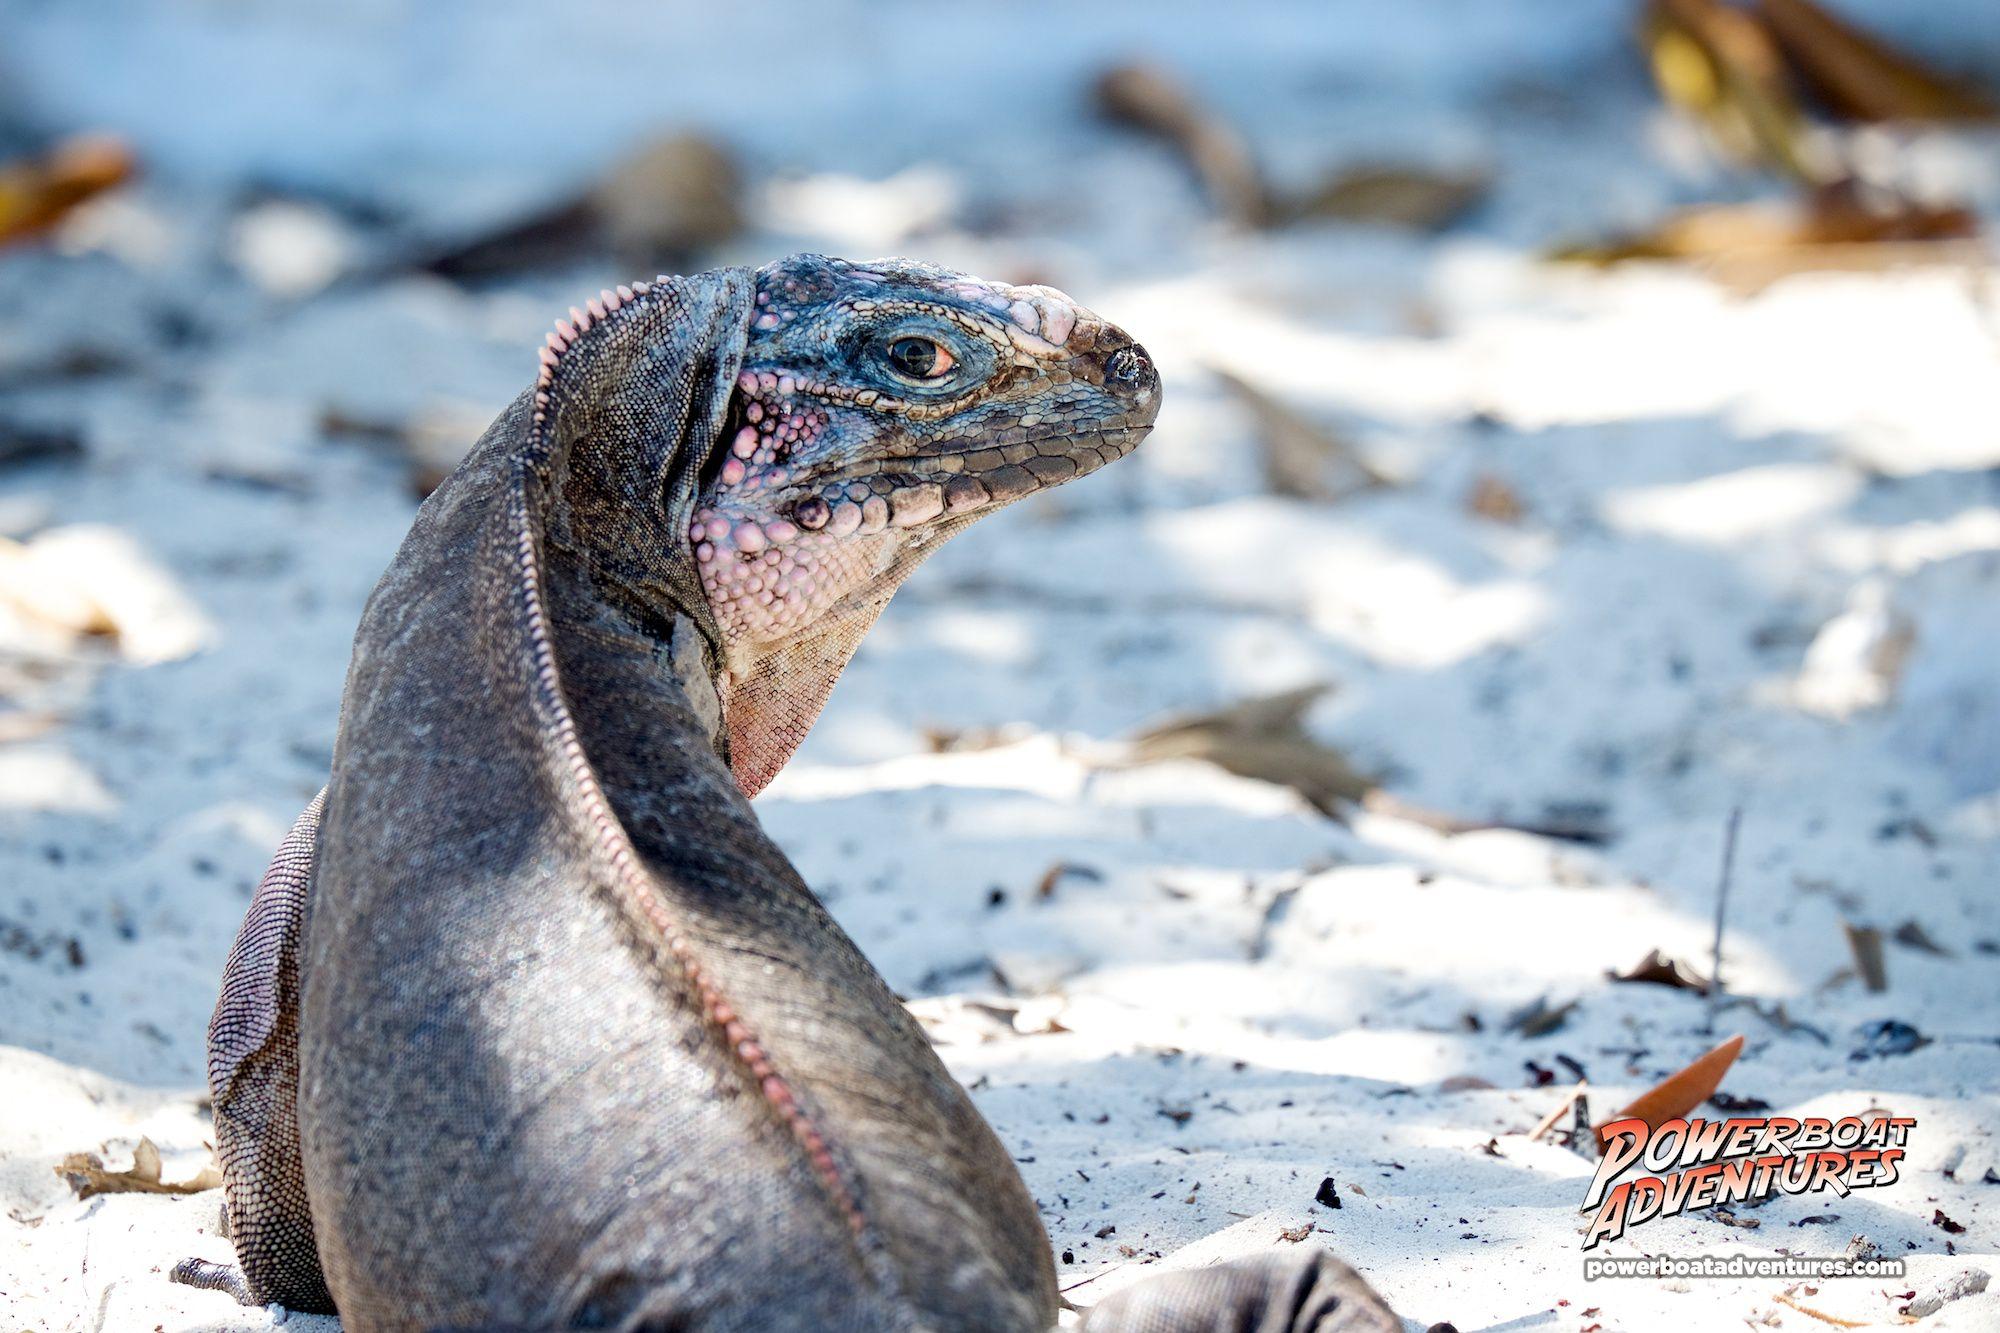 The Endangered Bahamian Rock Iguana's of Allan's Cay